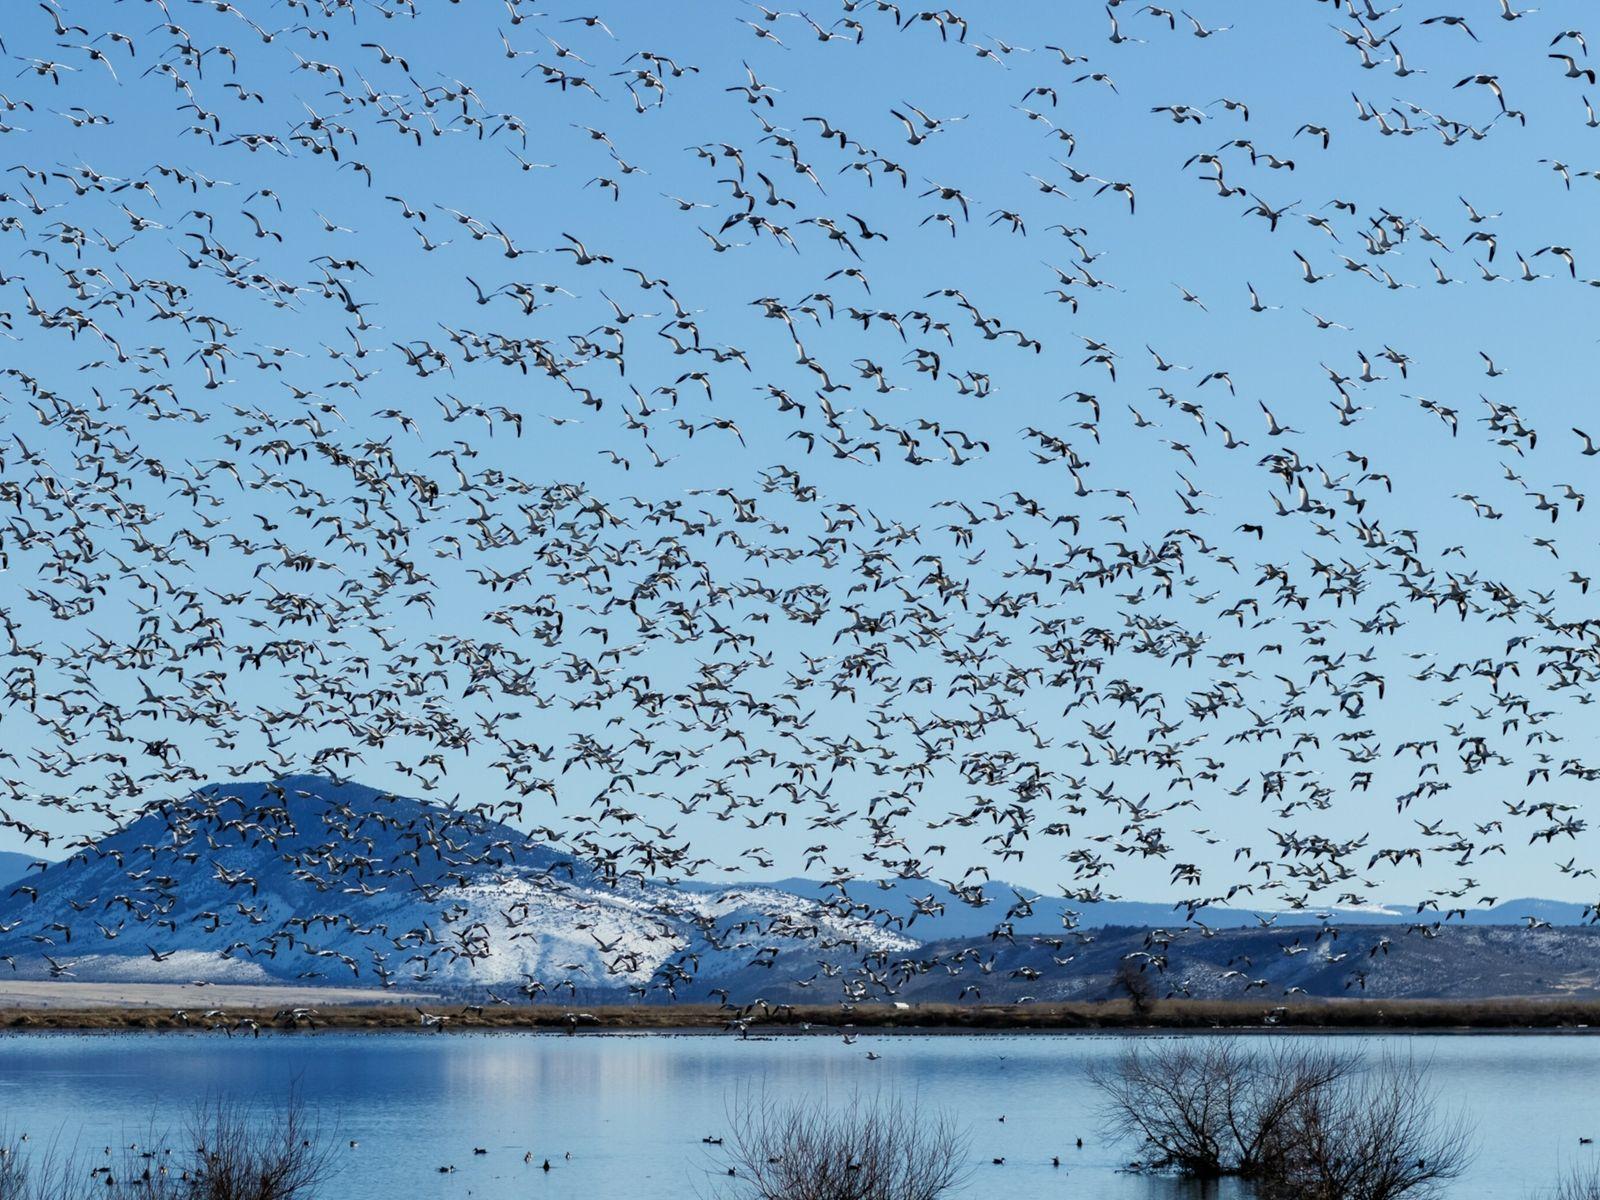 Bird Migrating